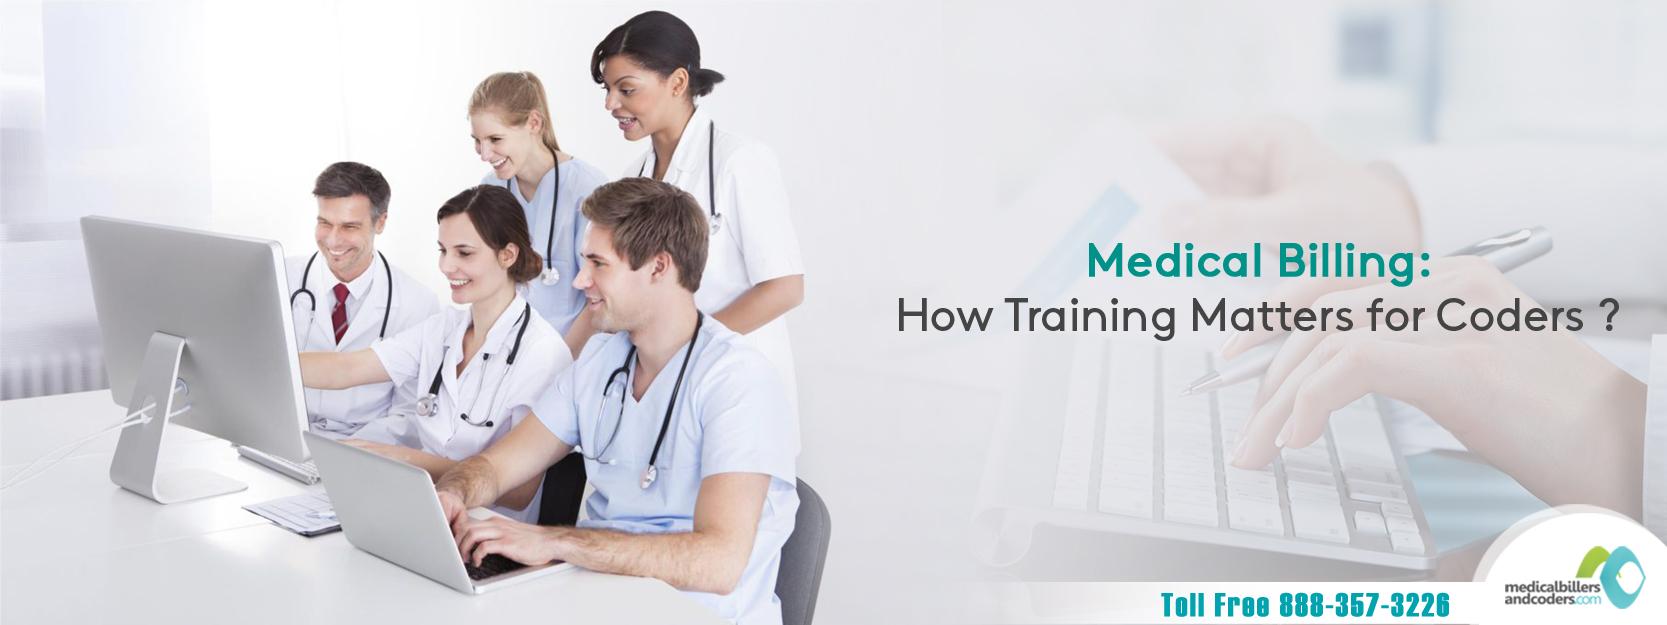 Medical-Billing-How-Training-Matters-for-Coders.jpg